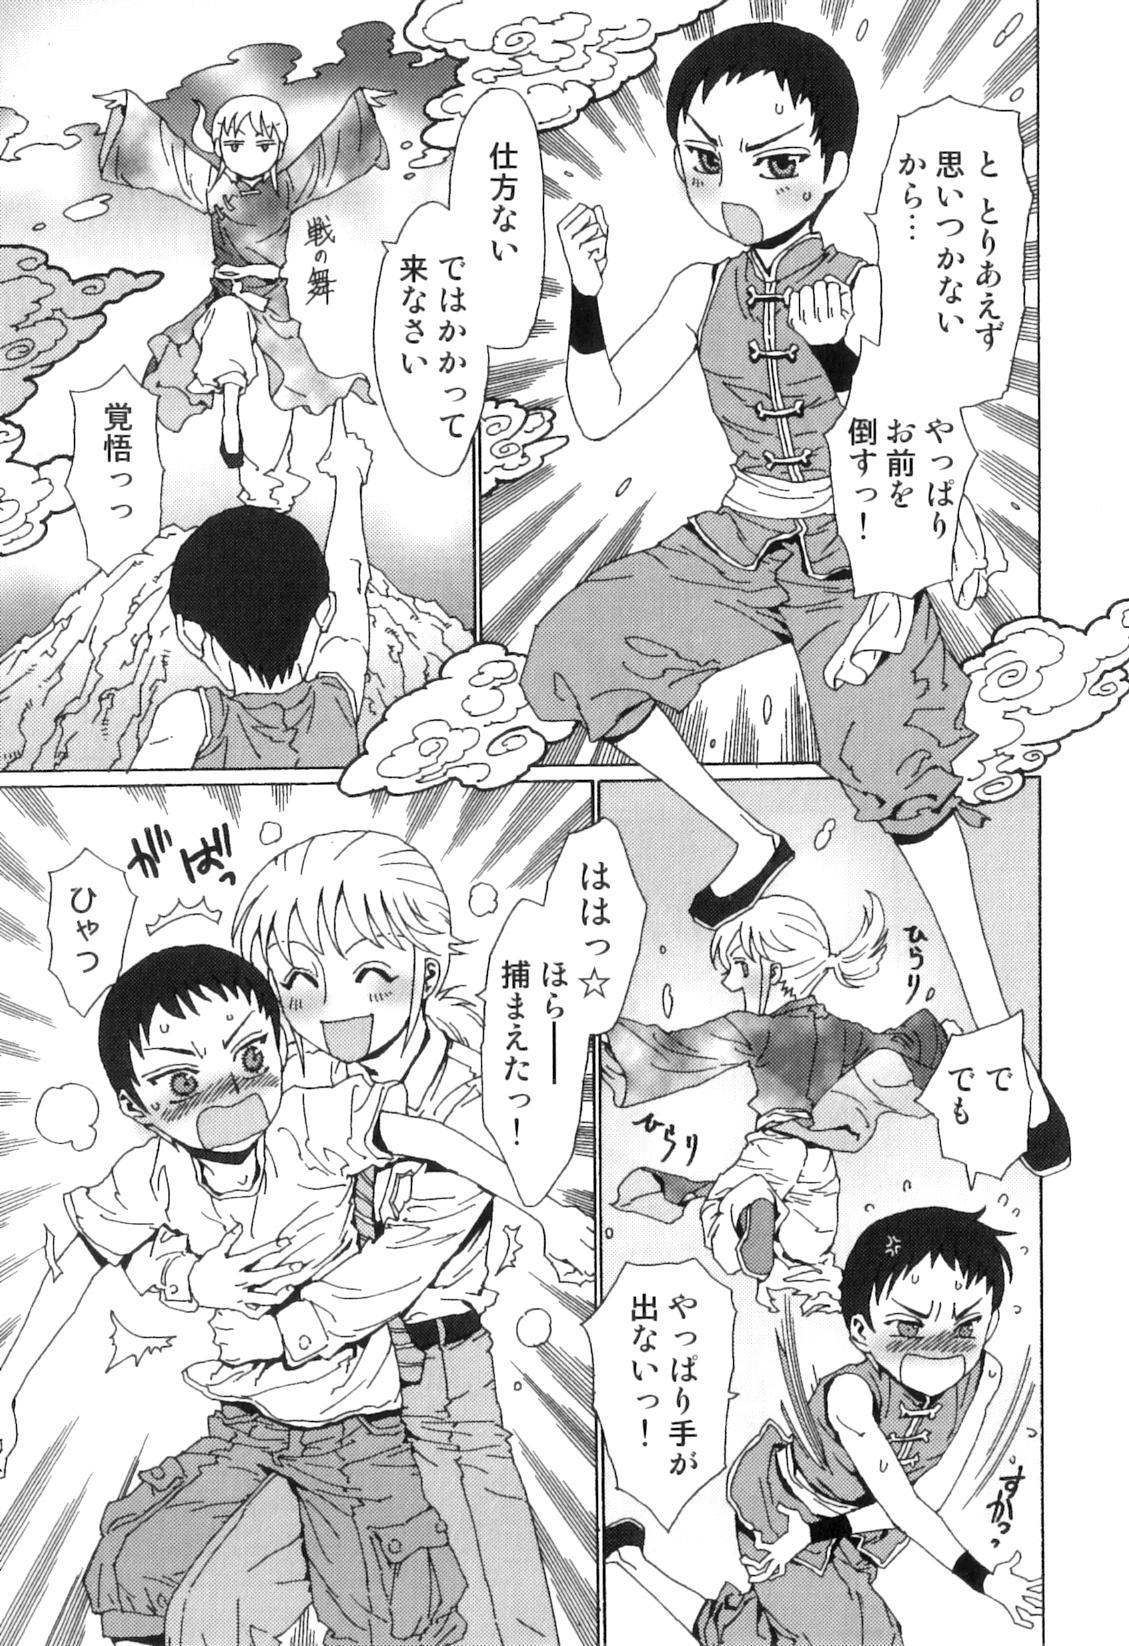 Yuni-Hapi 79